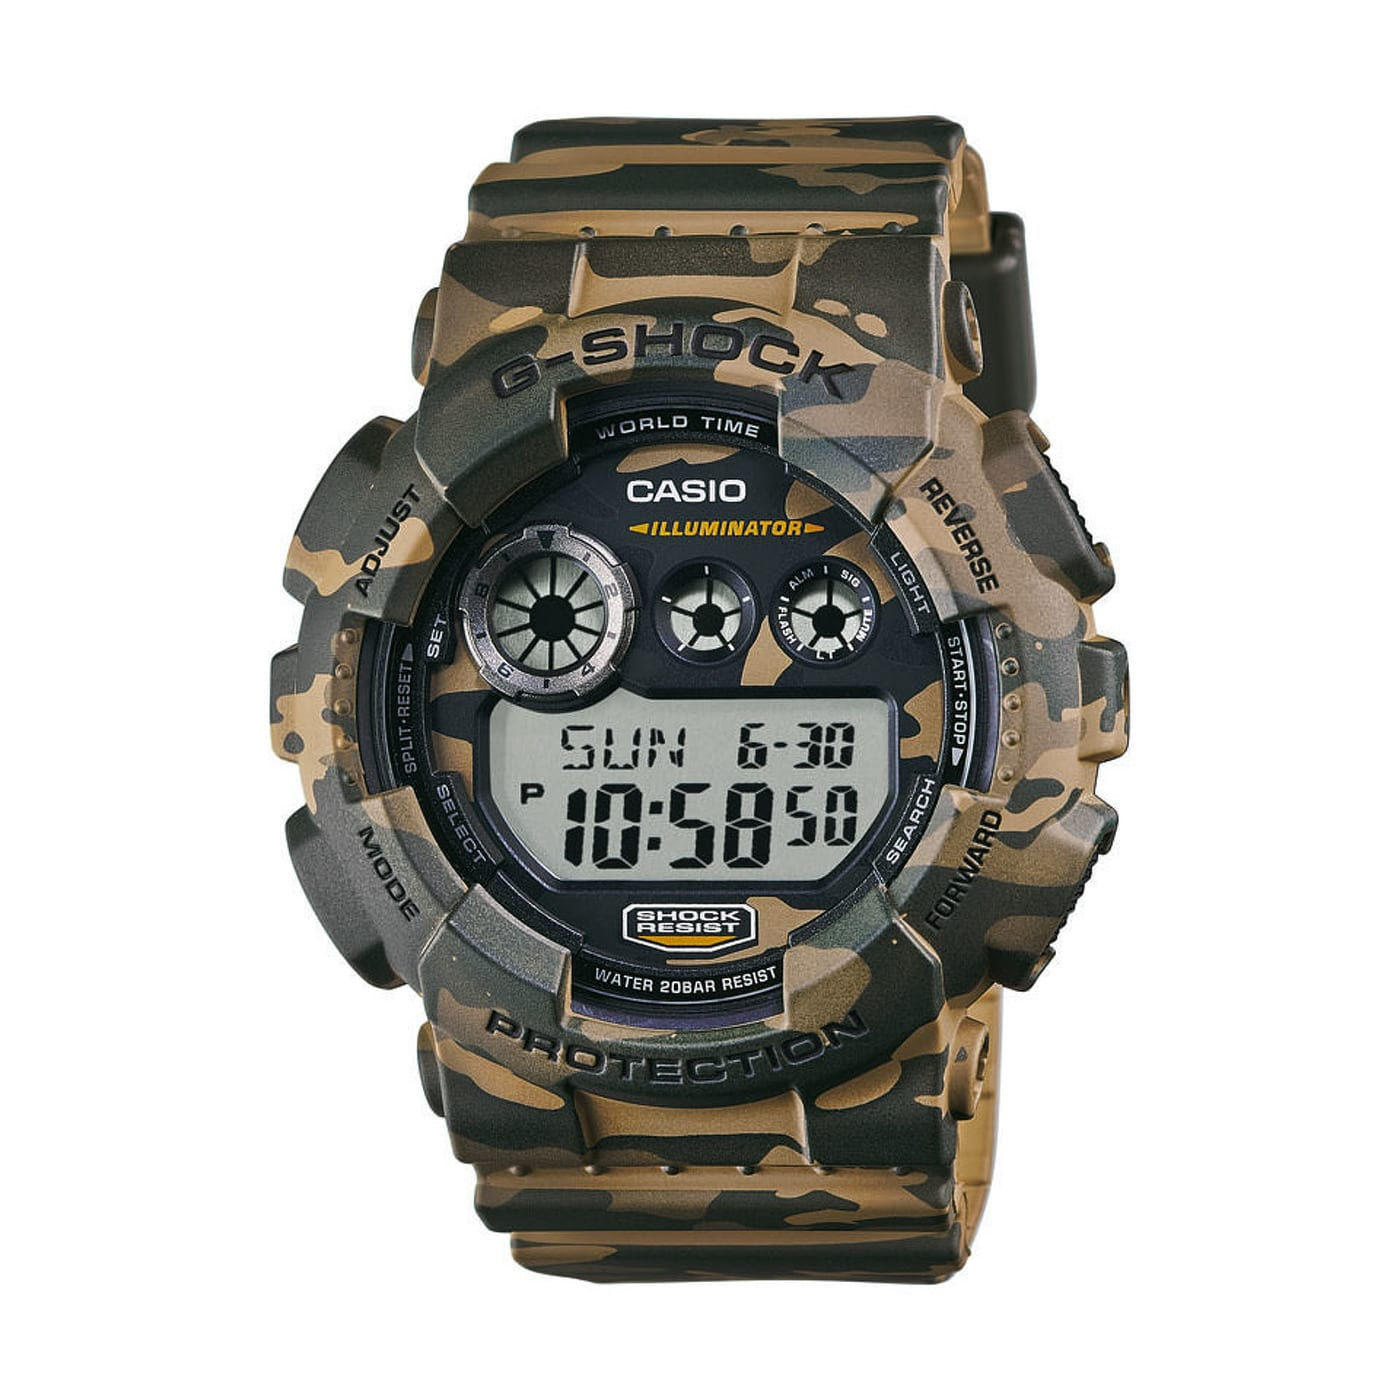 Casio G-Shock GD 120CM-5ER PL brown camo